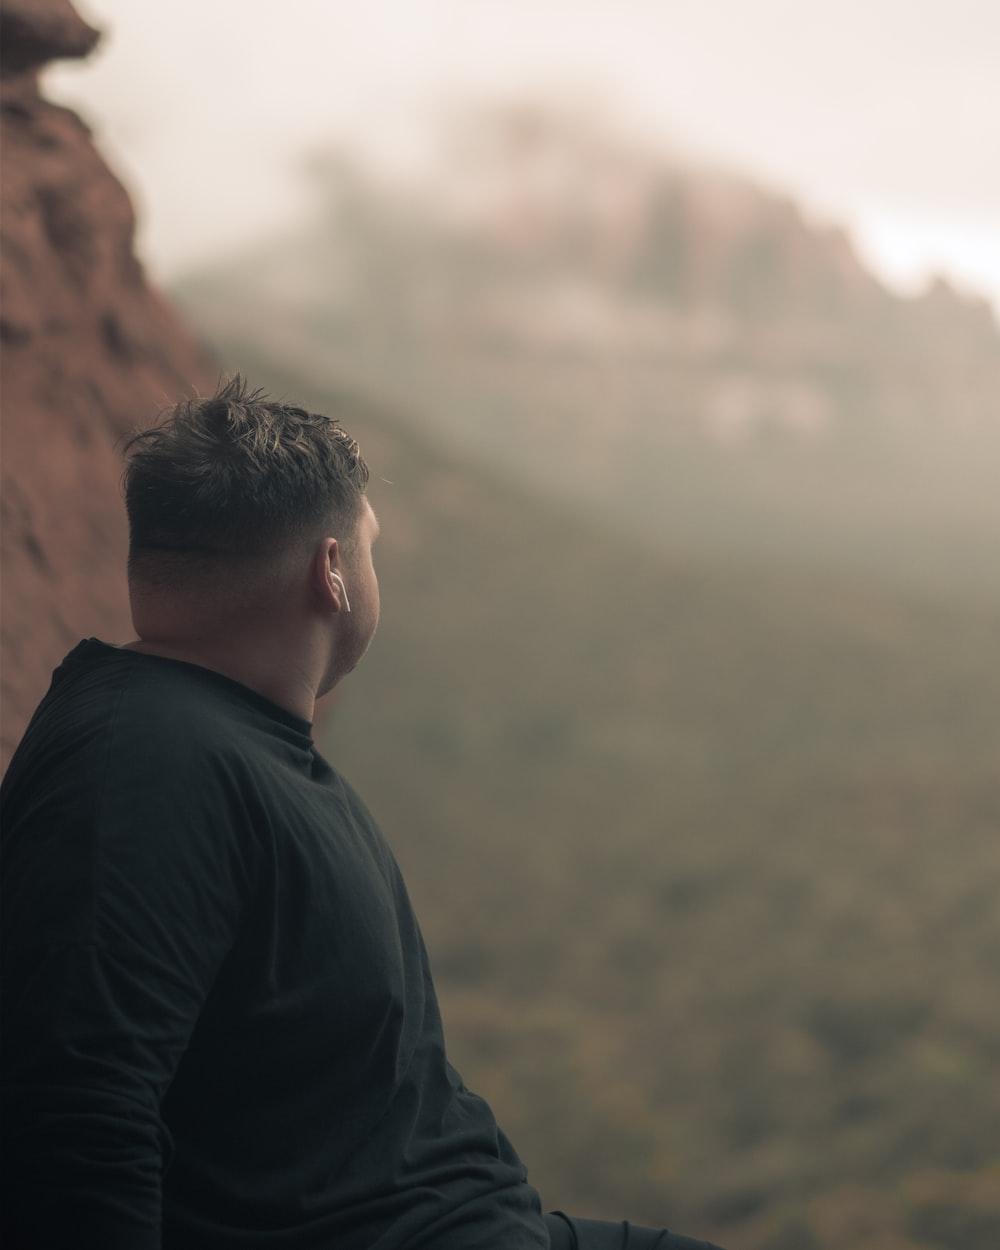 man in black long sleeve shirt standing on brown rock during daytime